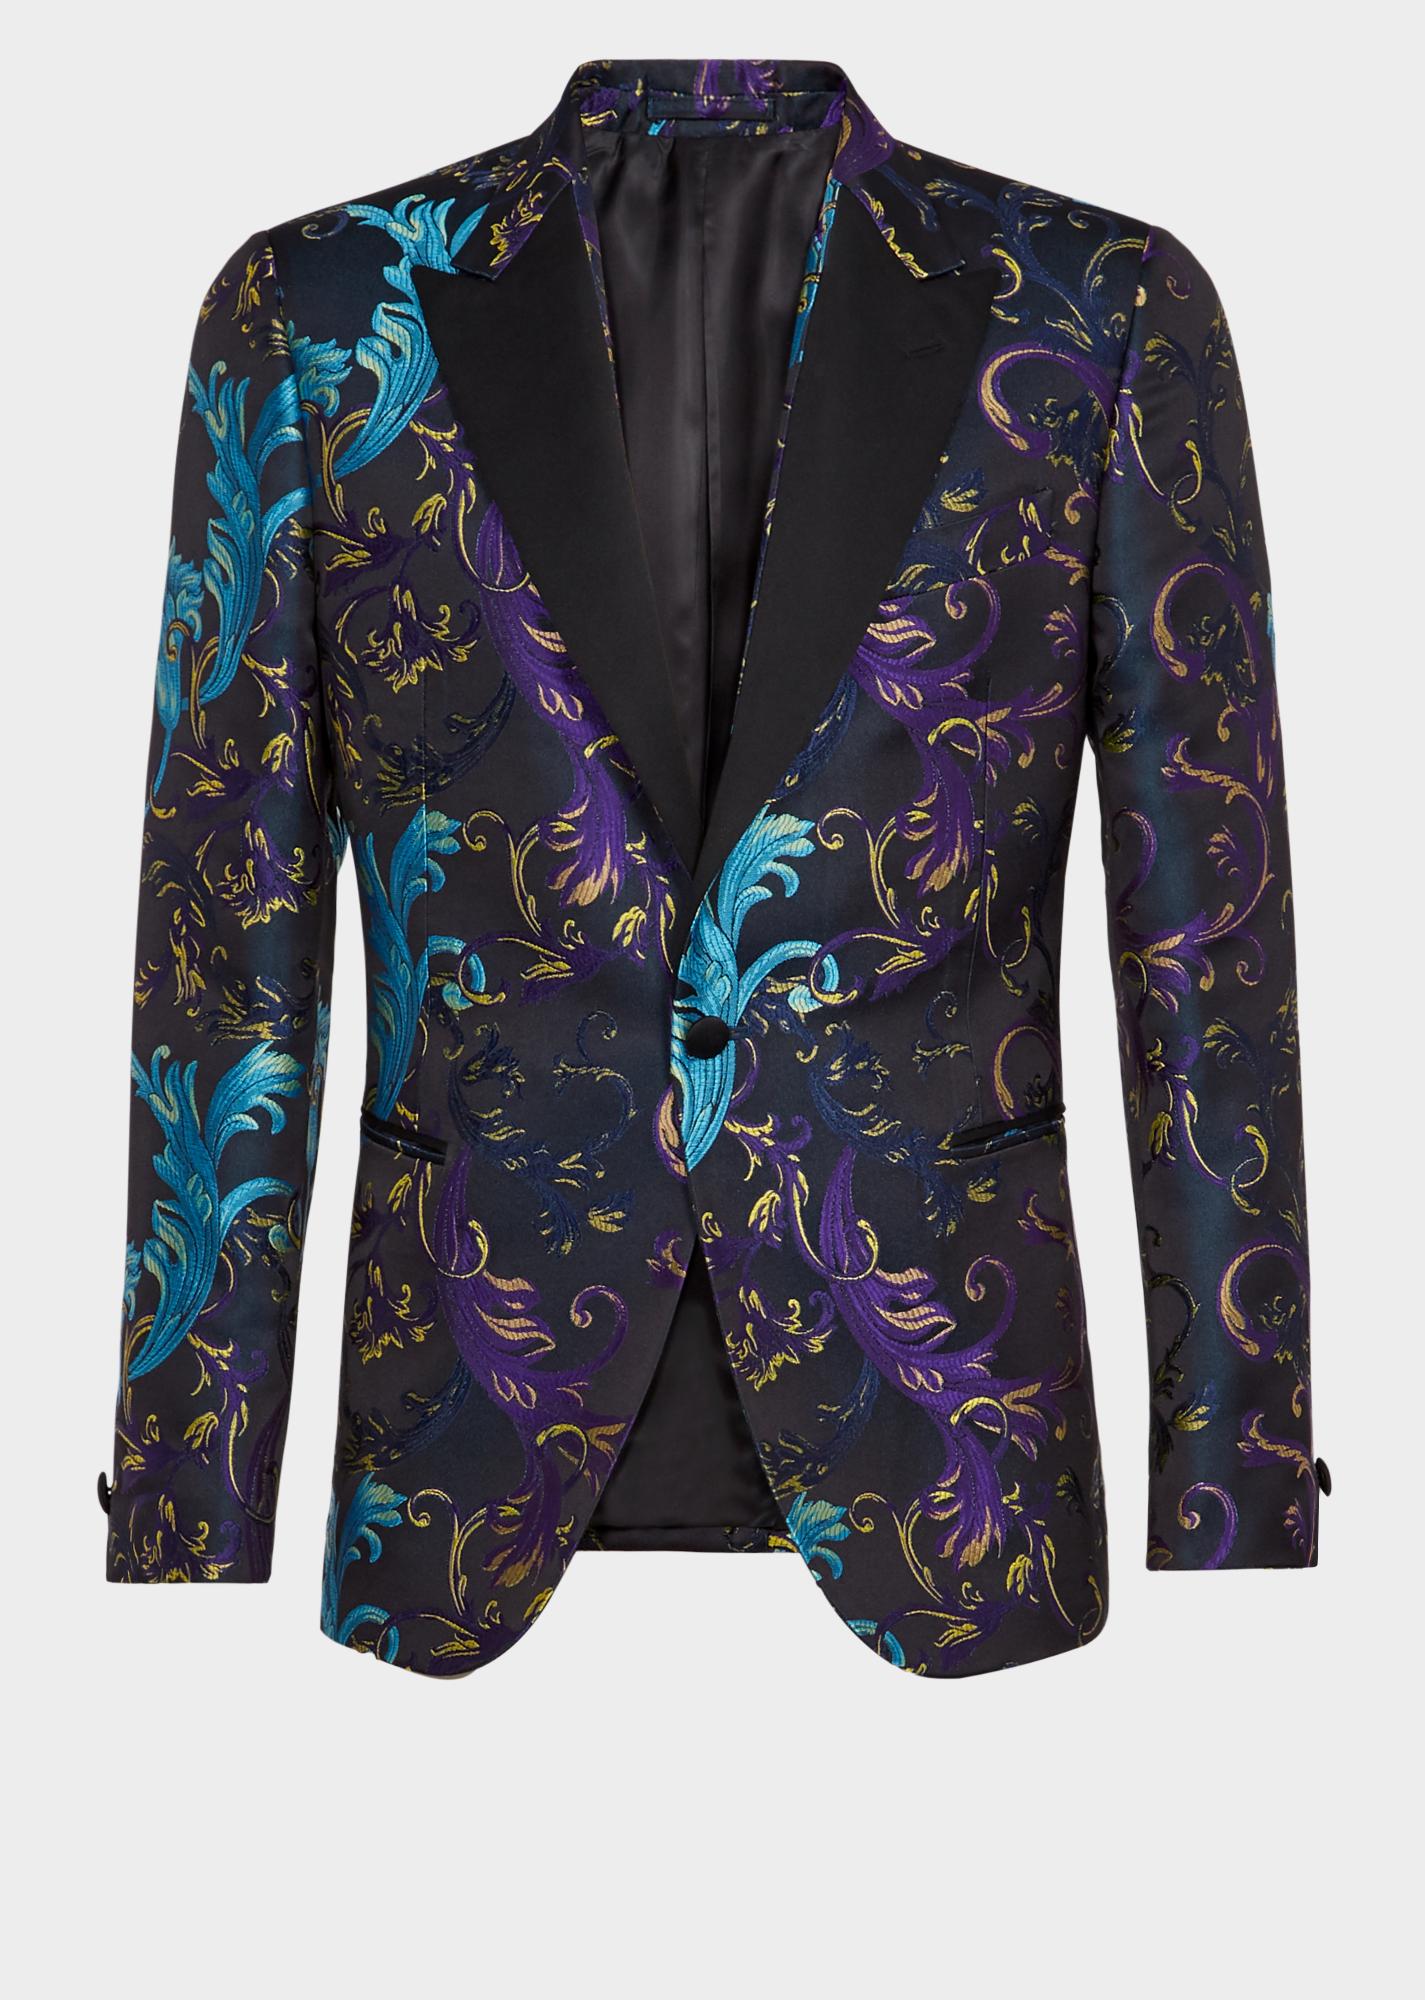 aaee511bad Versace Acid Baroque Blazer jacket | Jacket vibes in 2019 | Blazers ...